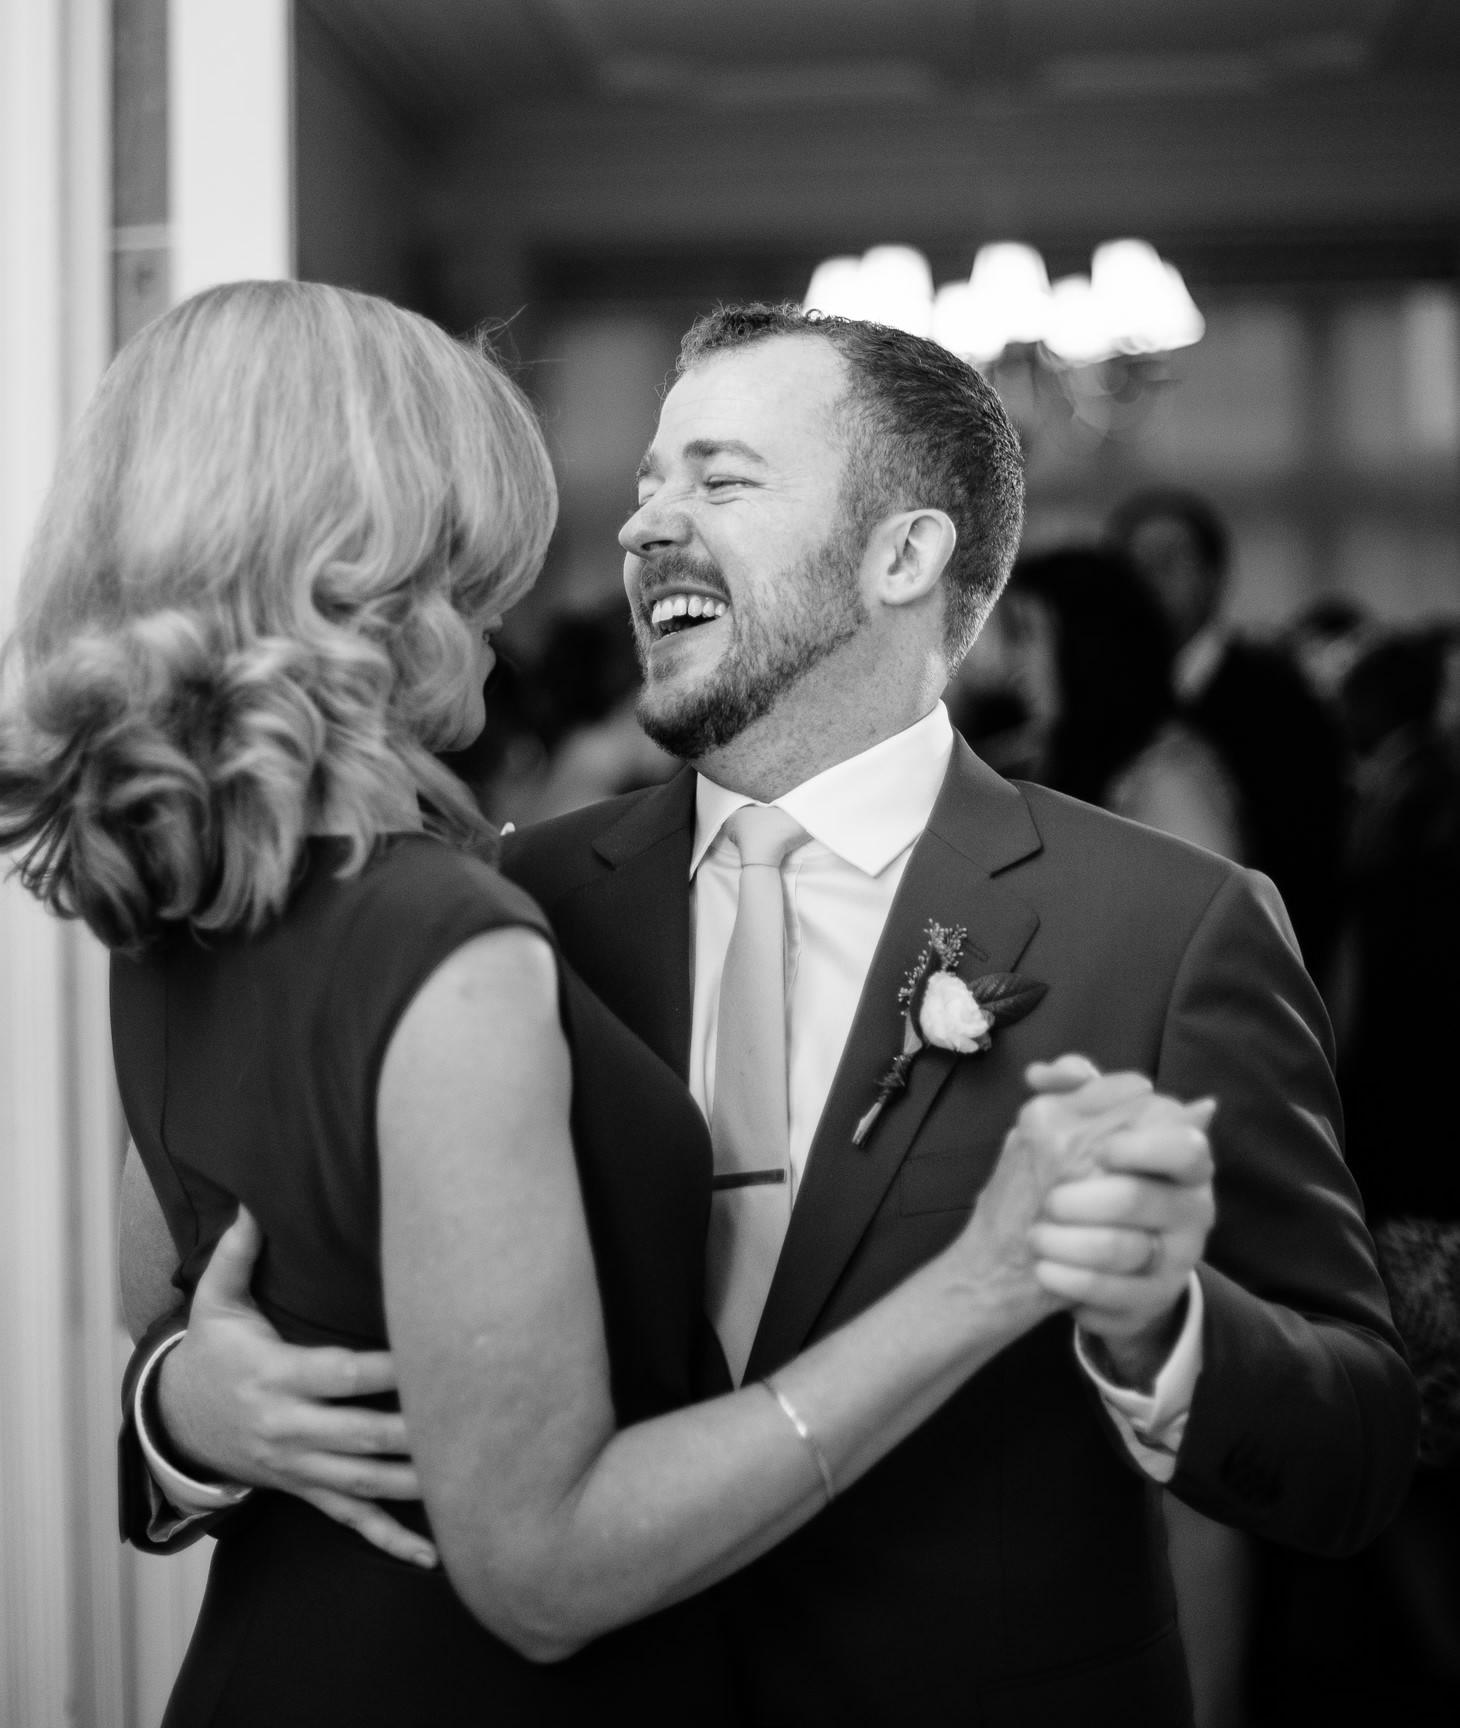 x-brooklyn-restaurant-wedding-nyc-weddingi-photographer-smitten-chickens174.jpg